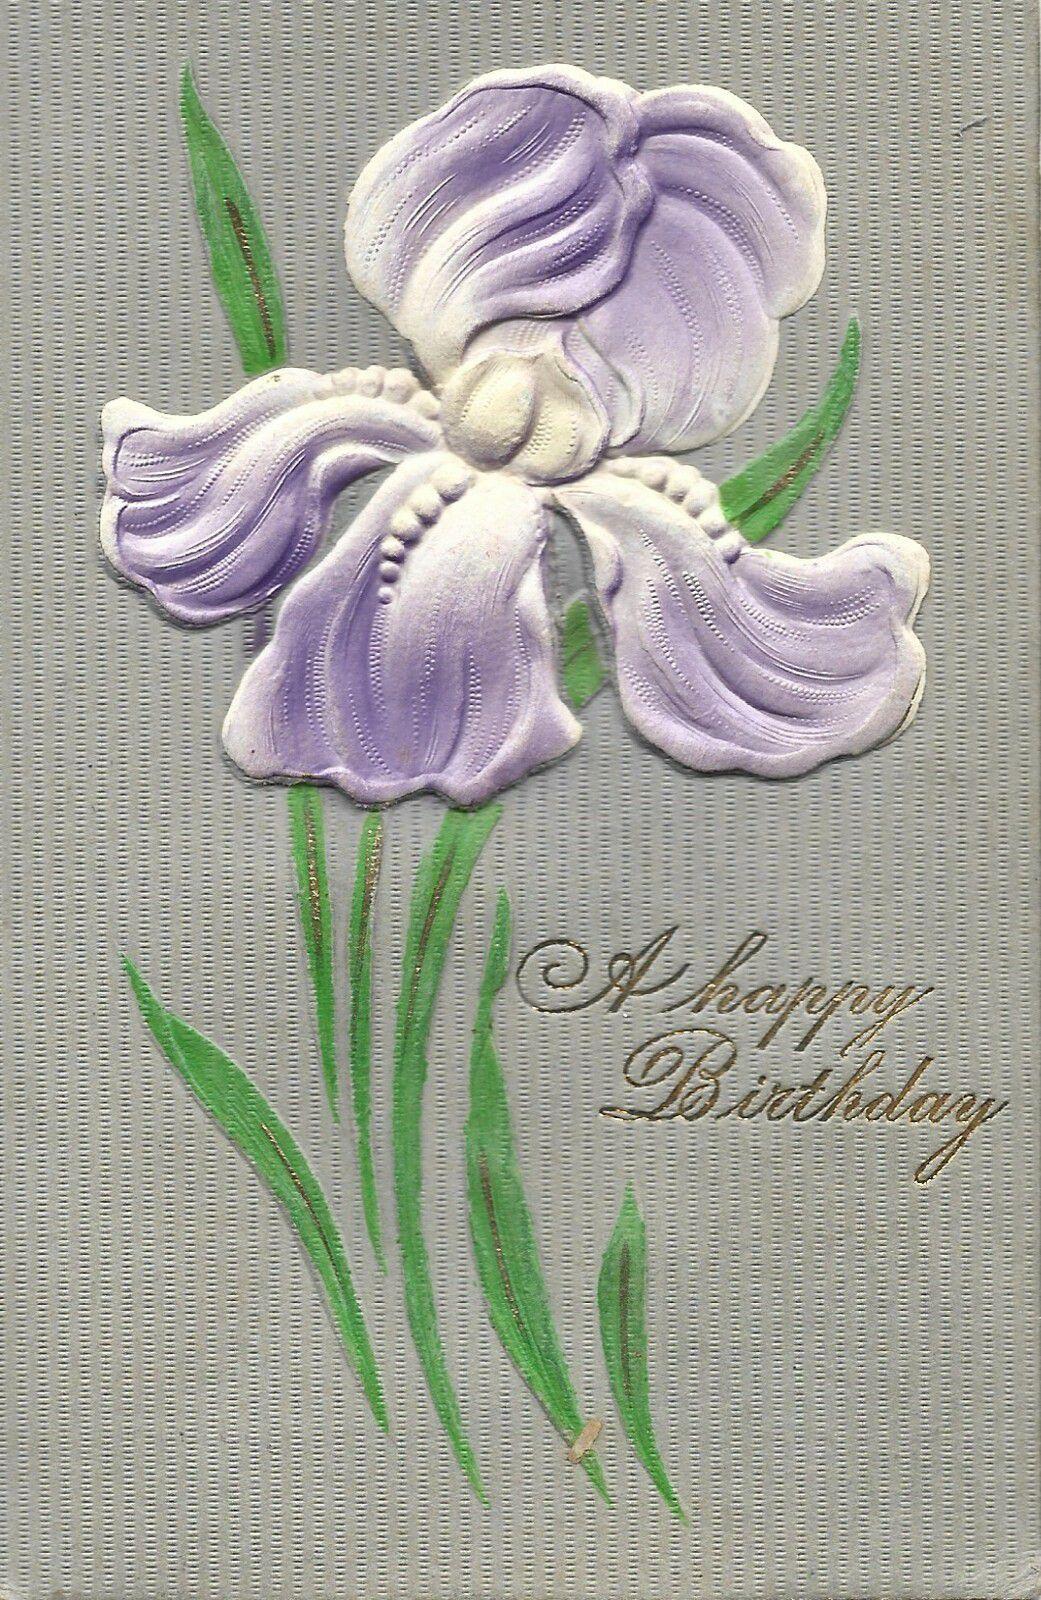 IRIS 2018 - A HAPPY BIRTHDAY - 16.04.1908